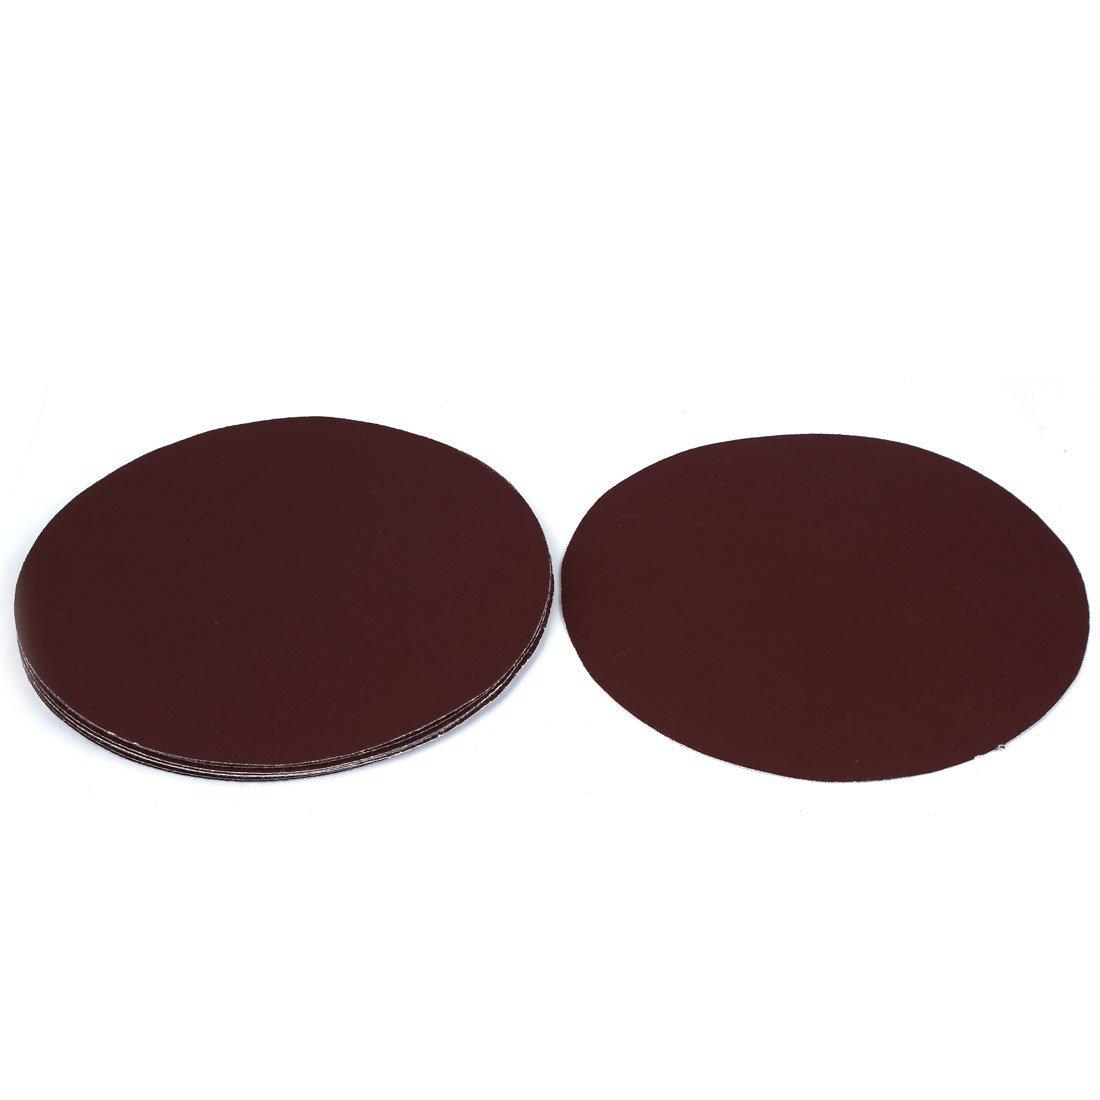 Portal Cool 8-inch Dia Abrasive Sanding Sandpaper Sheet Disc 320 Grit 10pcs Wide Spread SM-TRADICO-XU-HI-013292